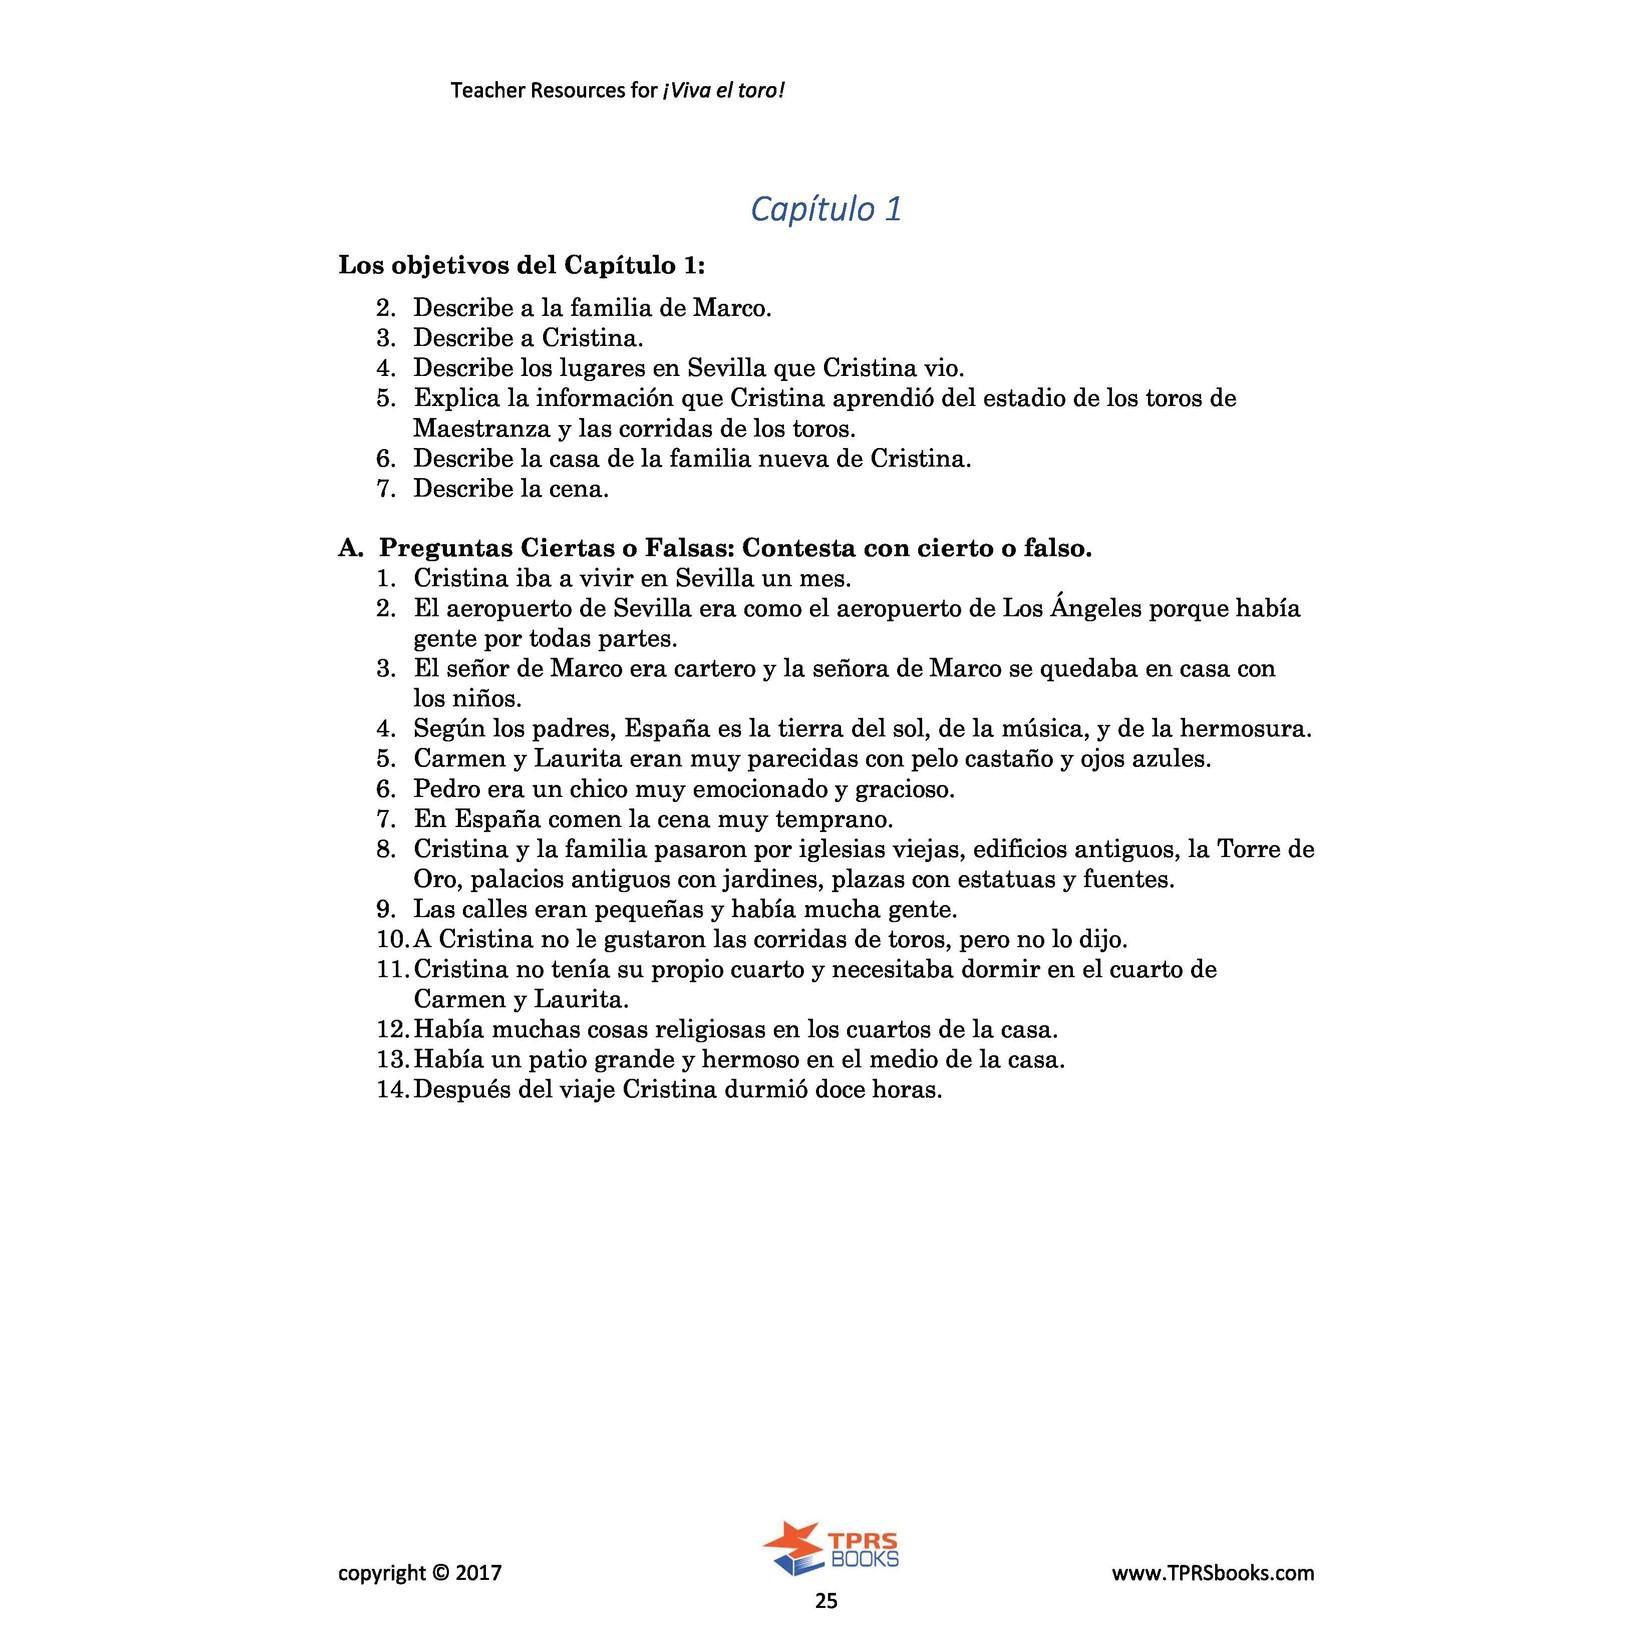 TPRS Books Viva el toro - Teacher's Guide